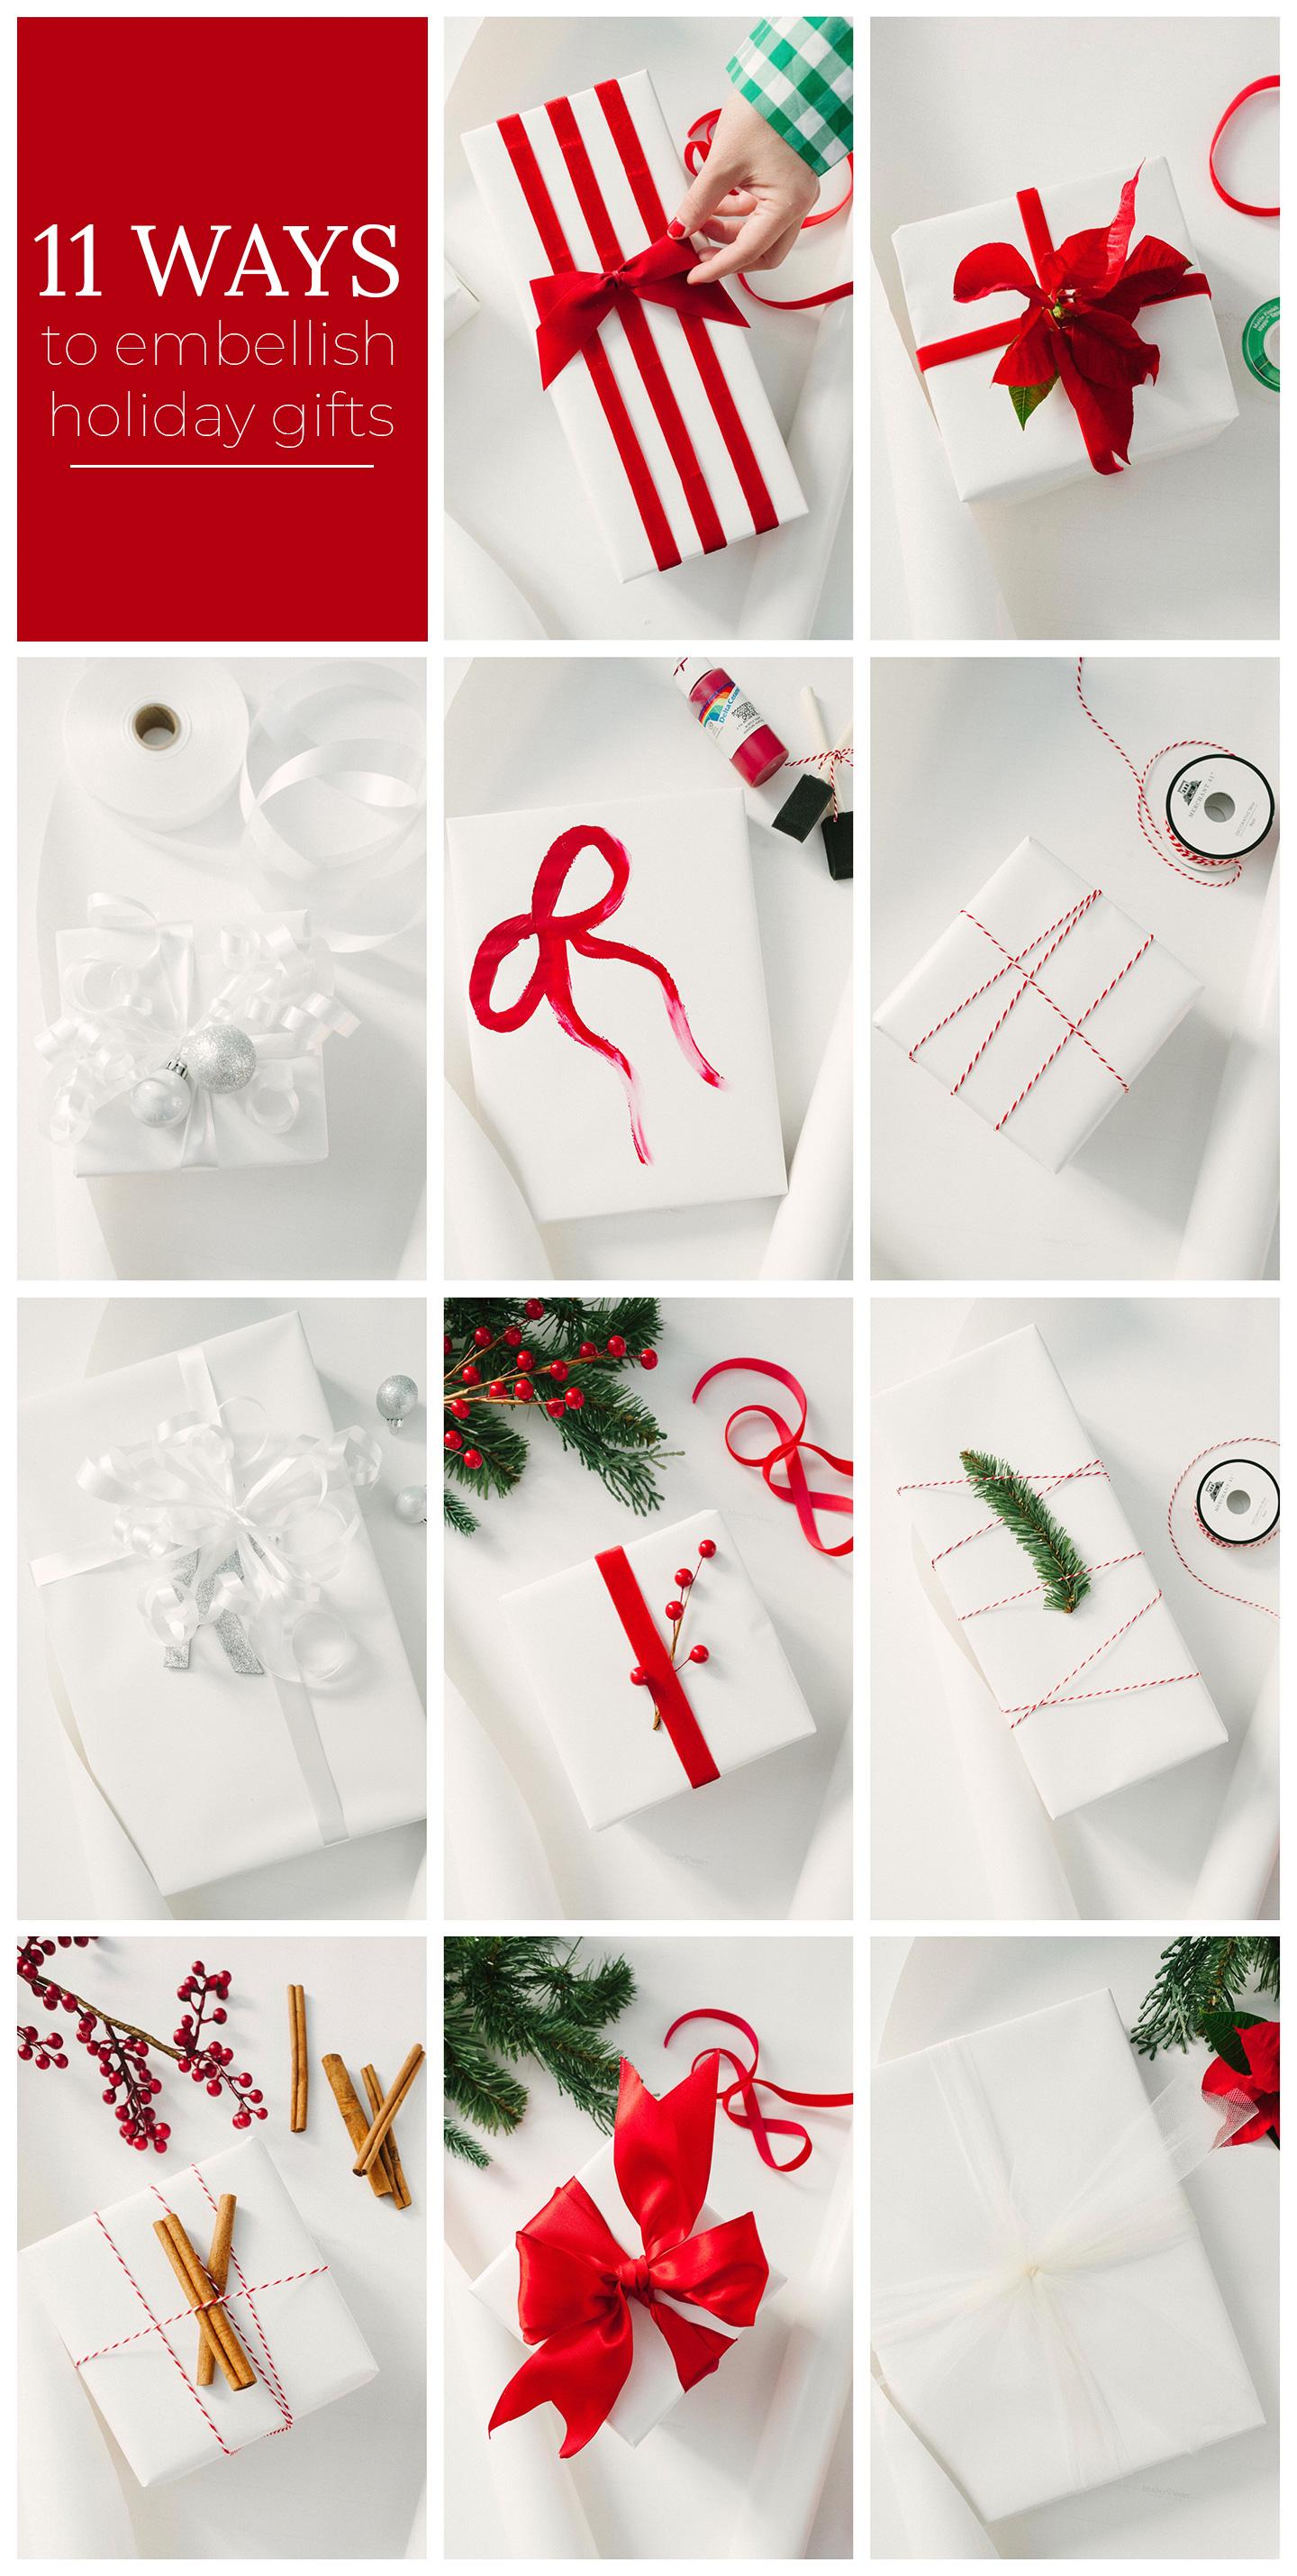 11 Ways to Embellish Holiday Gifts